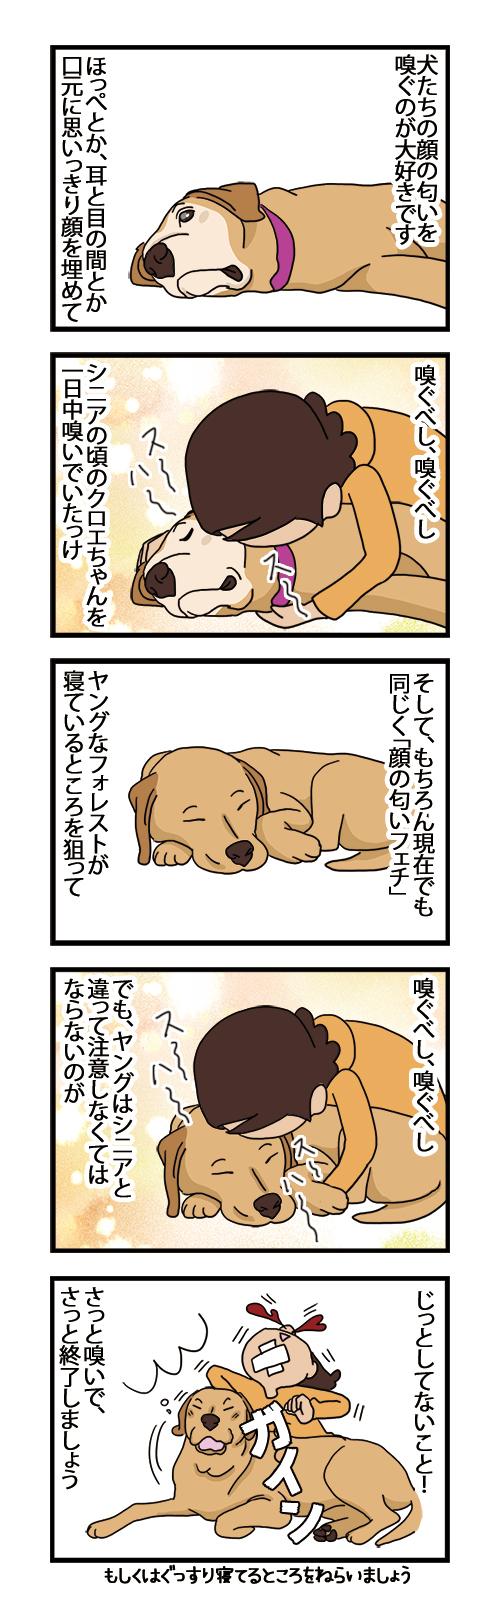 08012021_dogcomic.jpg